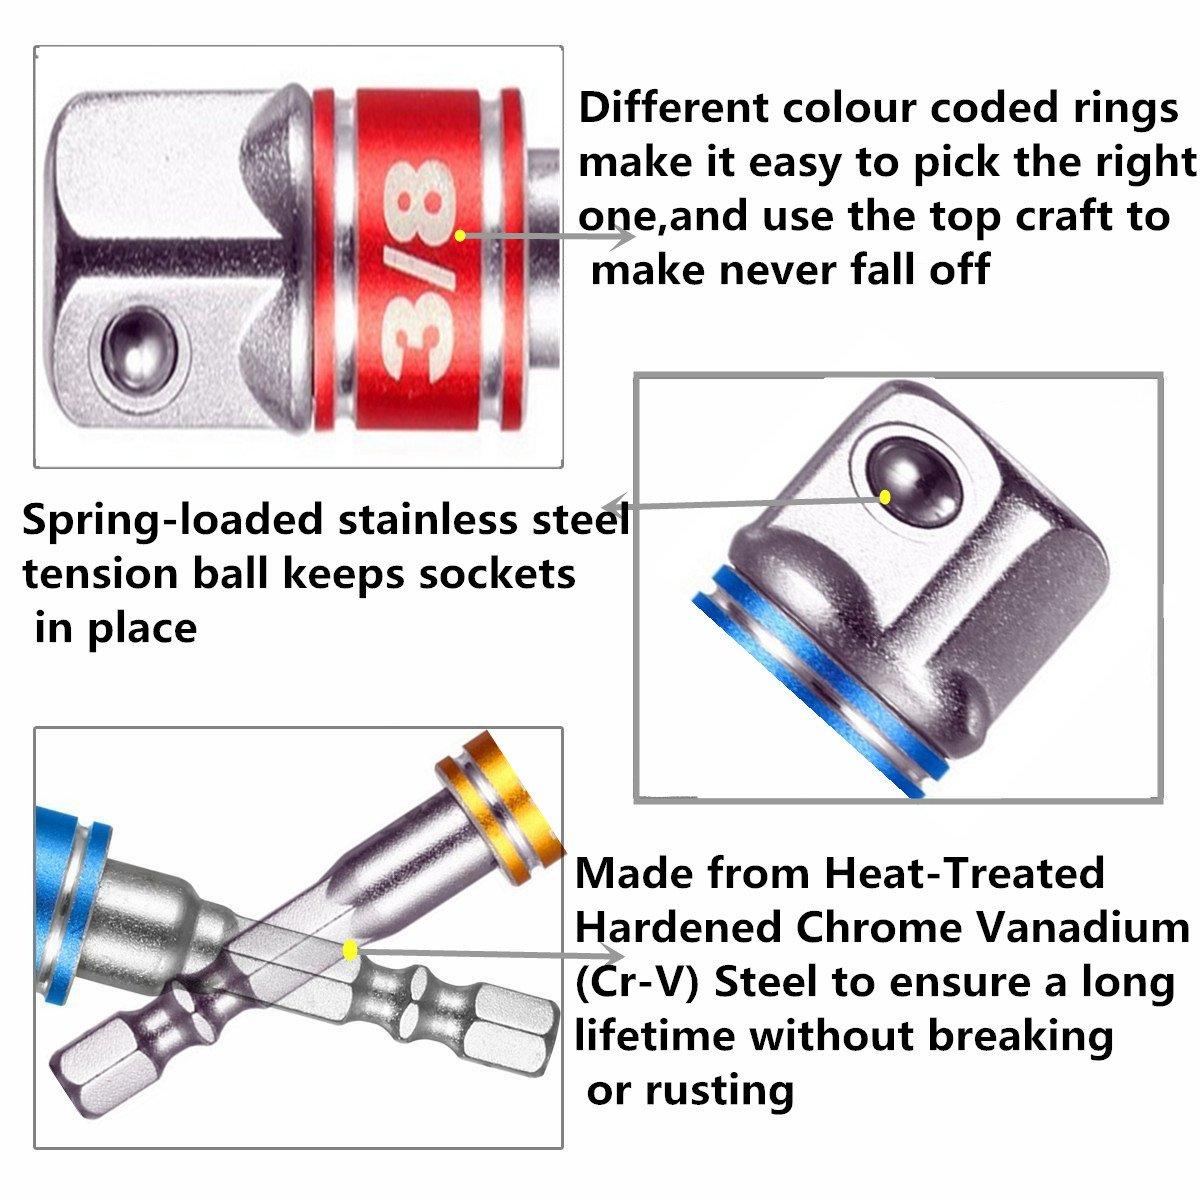 3Pcs 1//4 3//8 1//2 Cordless Impact Grade Socket Adapter Extension Set,for Universal Socket,Universal Joint Set,Socket Adapter and Drive Reducer Set,Drive Impact Socket Extension Bar Set,Automotive